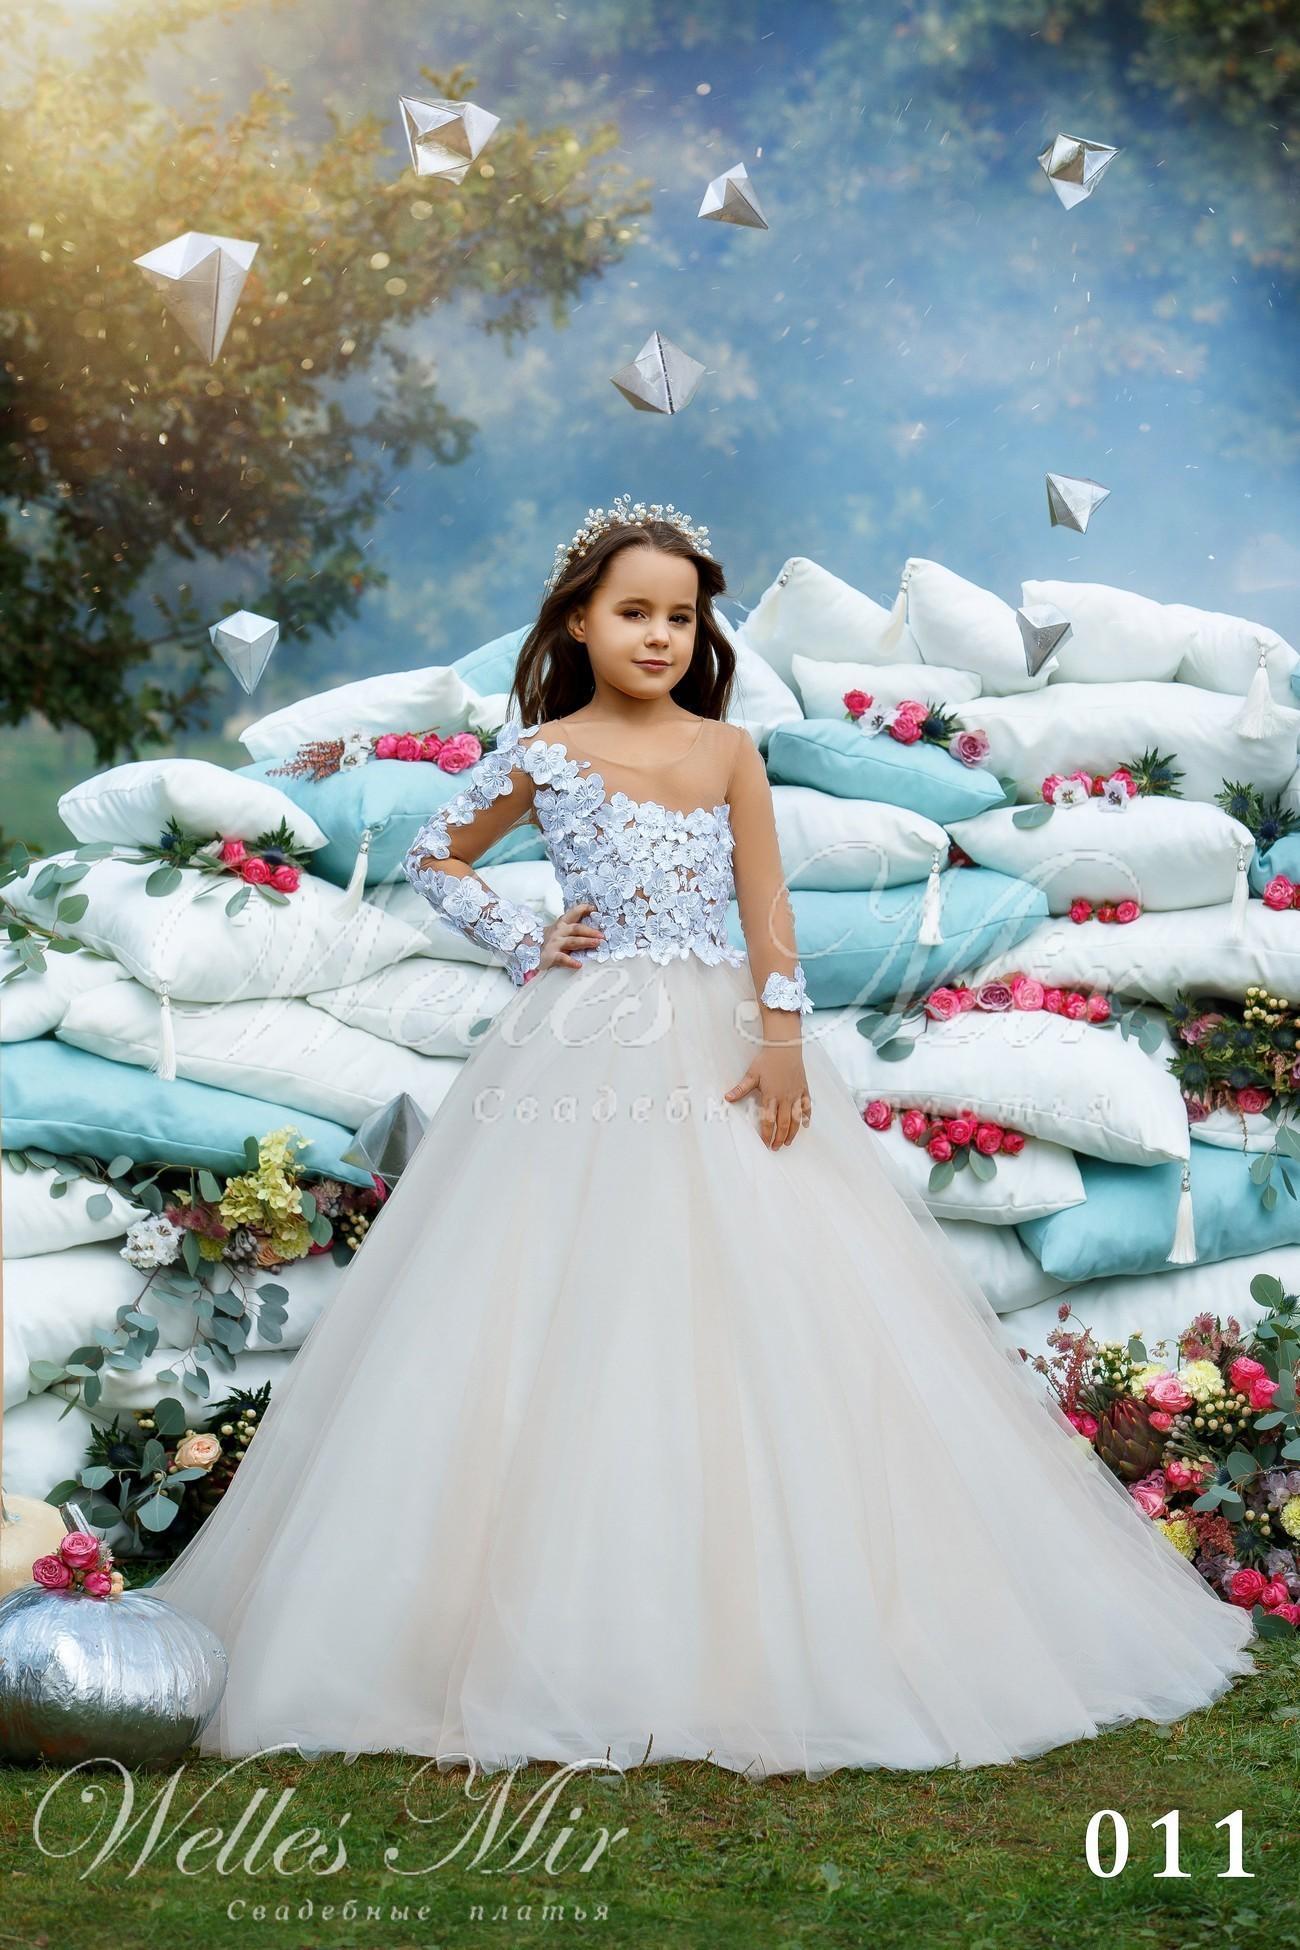 Детские платья Kids Deluxe Collection 2018 - 011